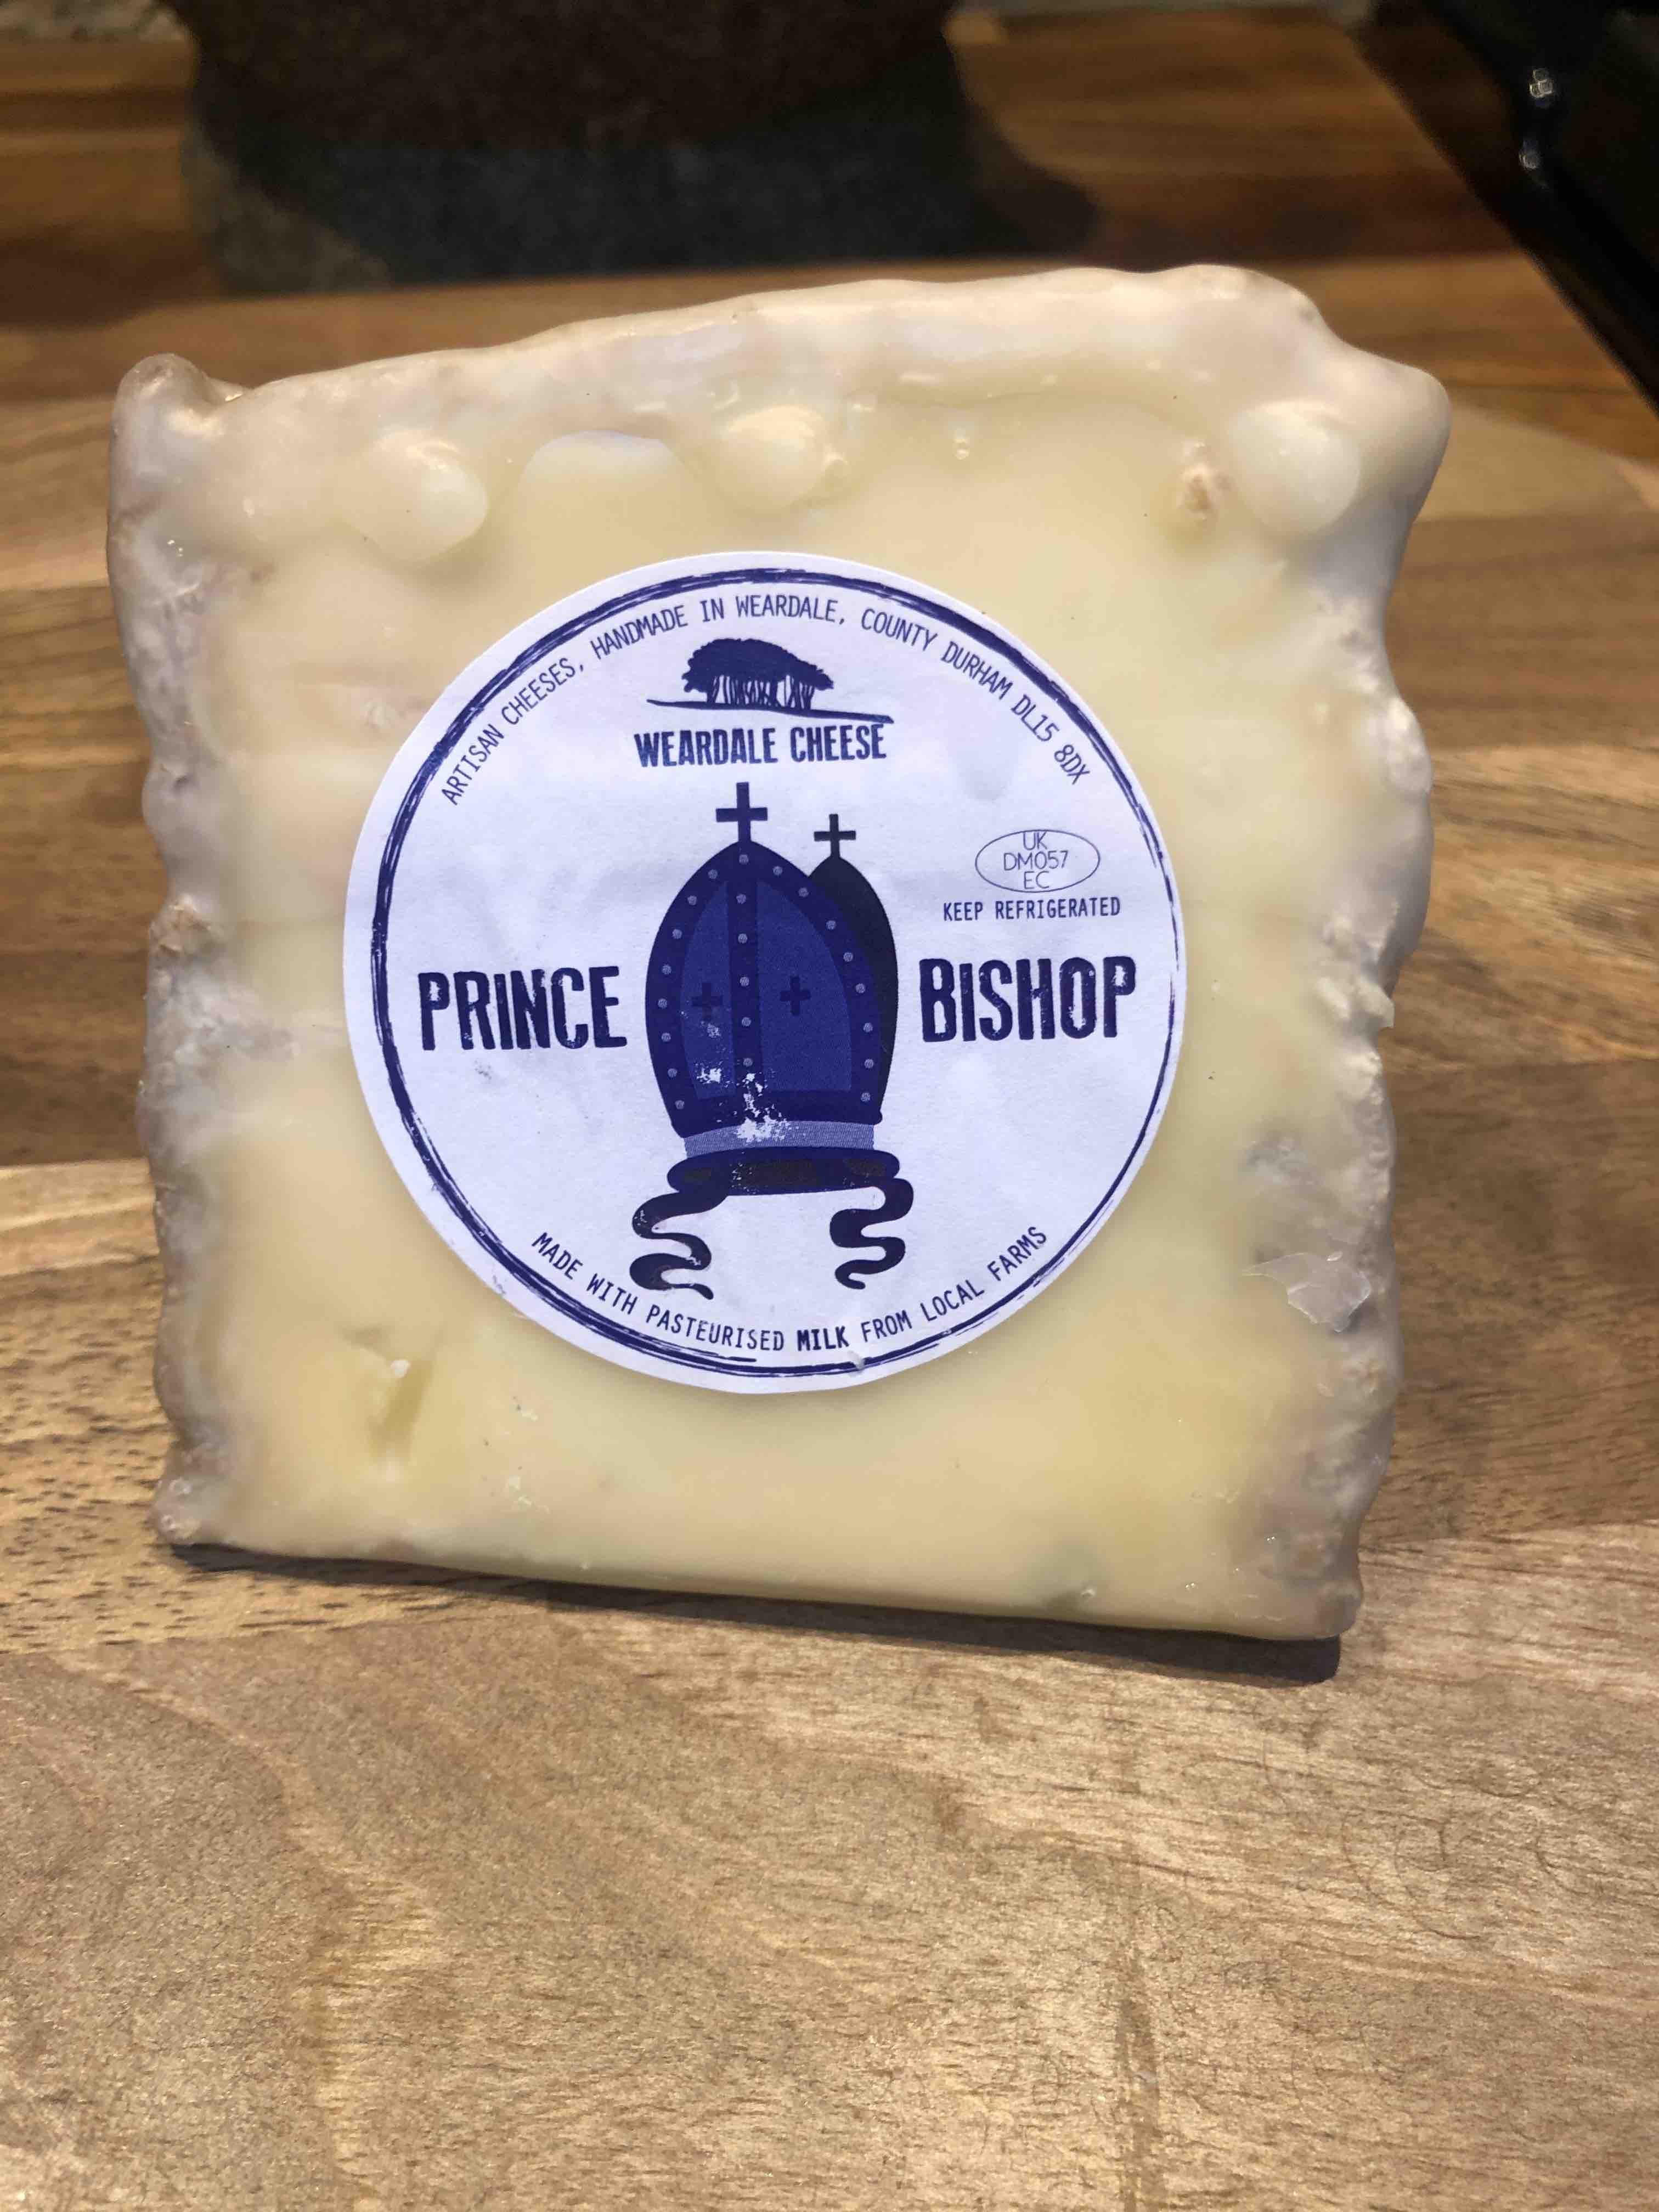 Weardale Cheese 'Prince Bishop' (160g)